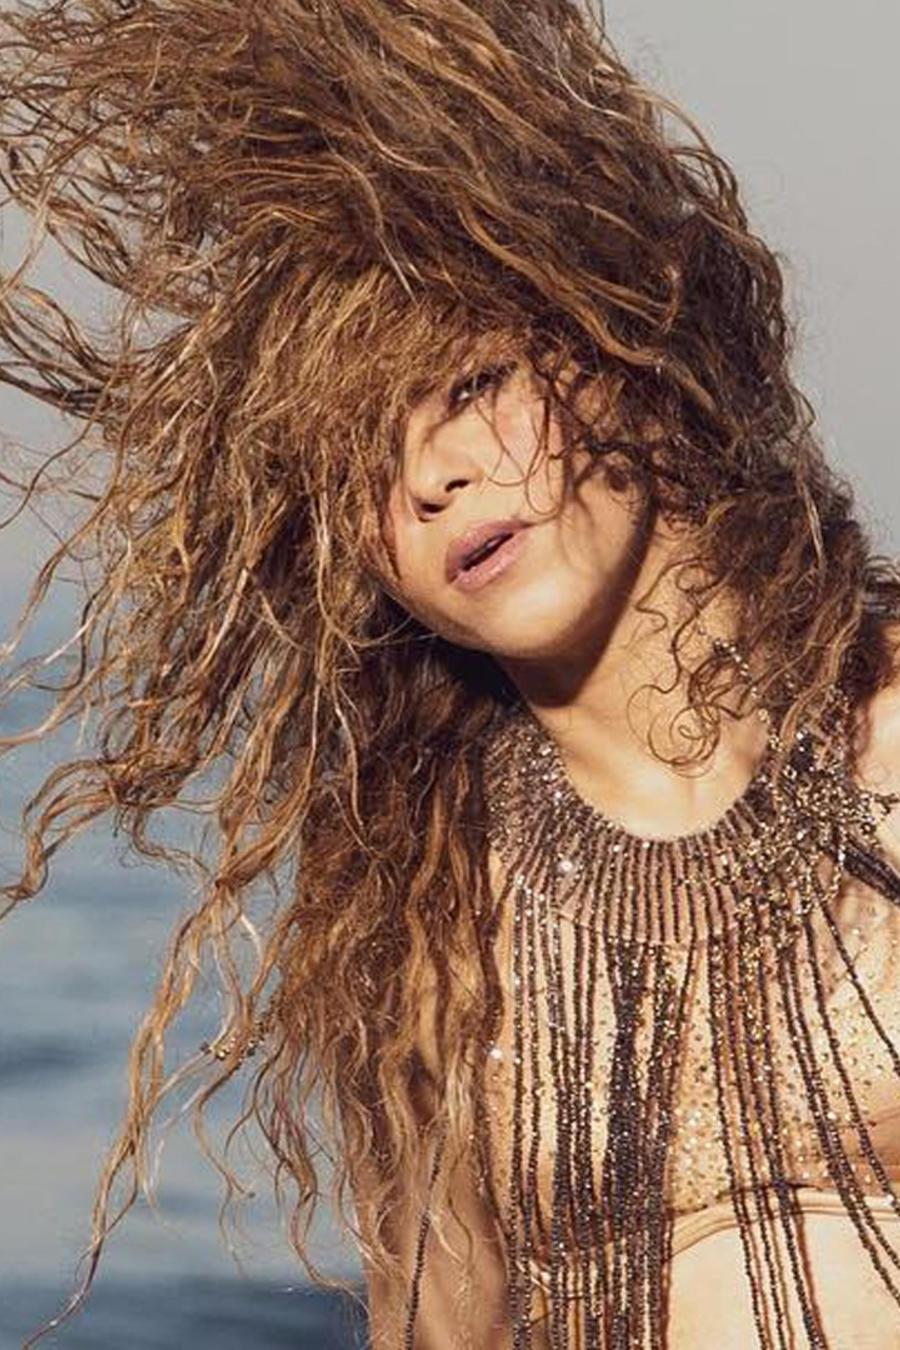 Shakira en Clandestino con Maluma